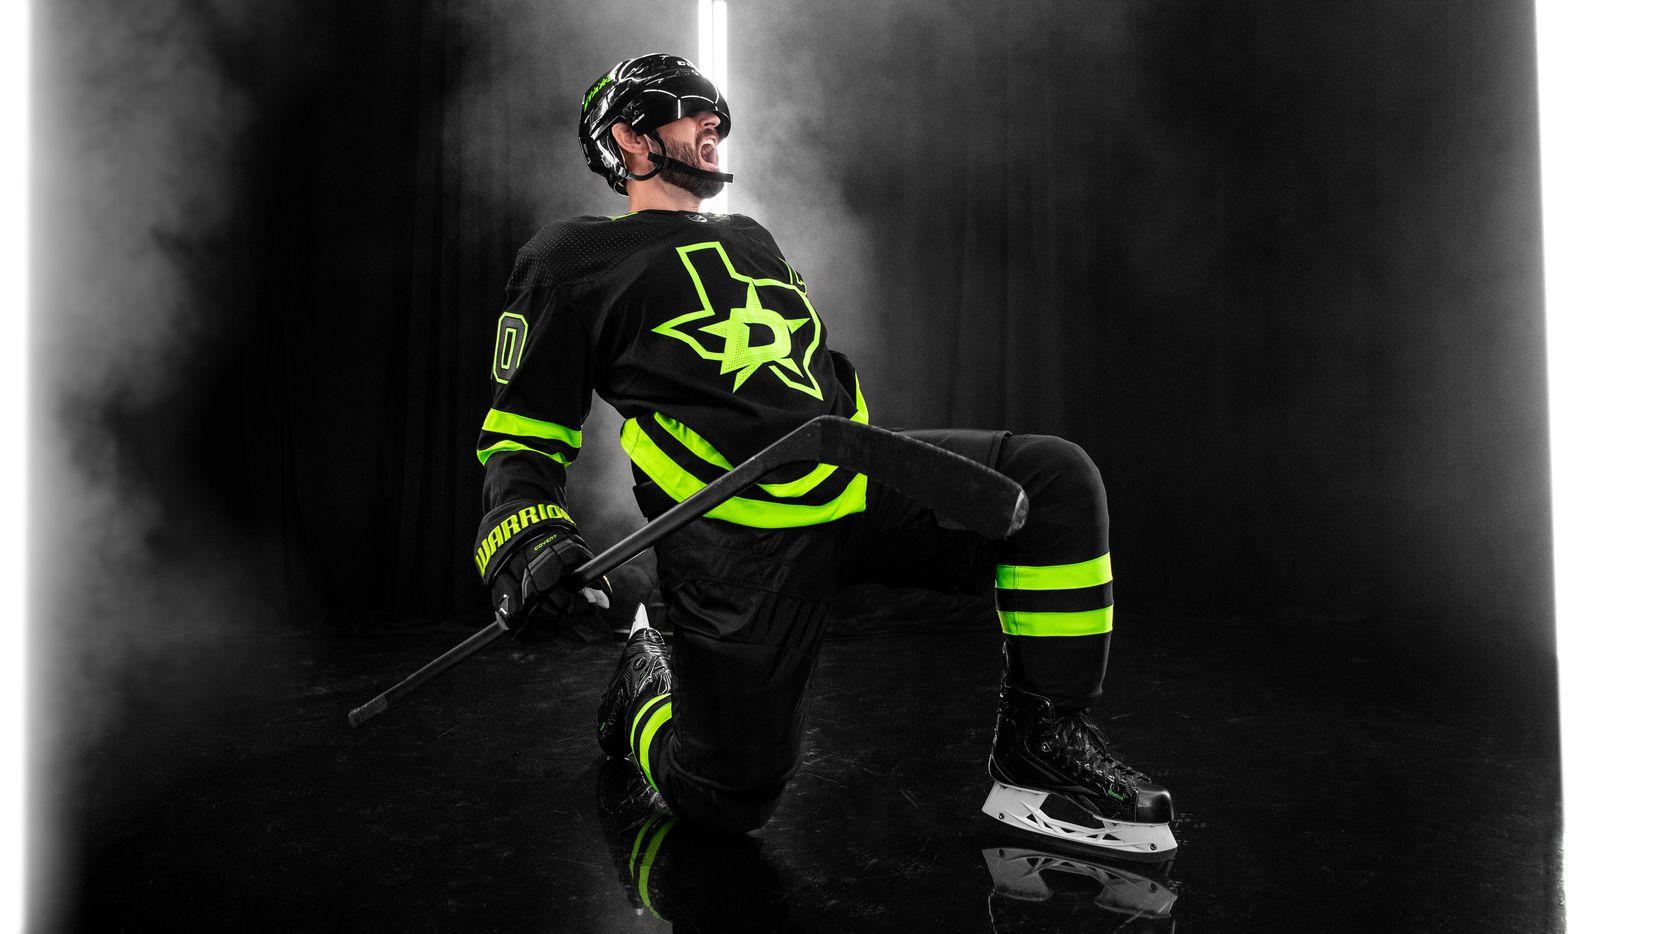 Dallas Stars unveil new black and neon green alternate jersey